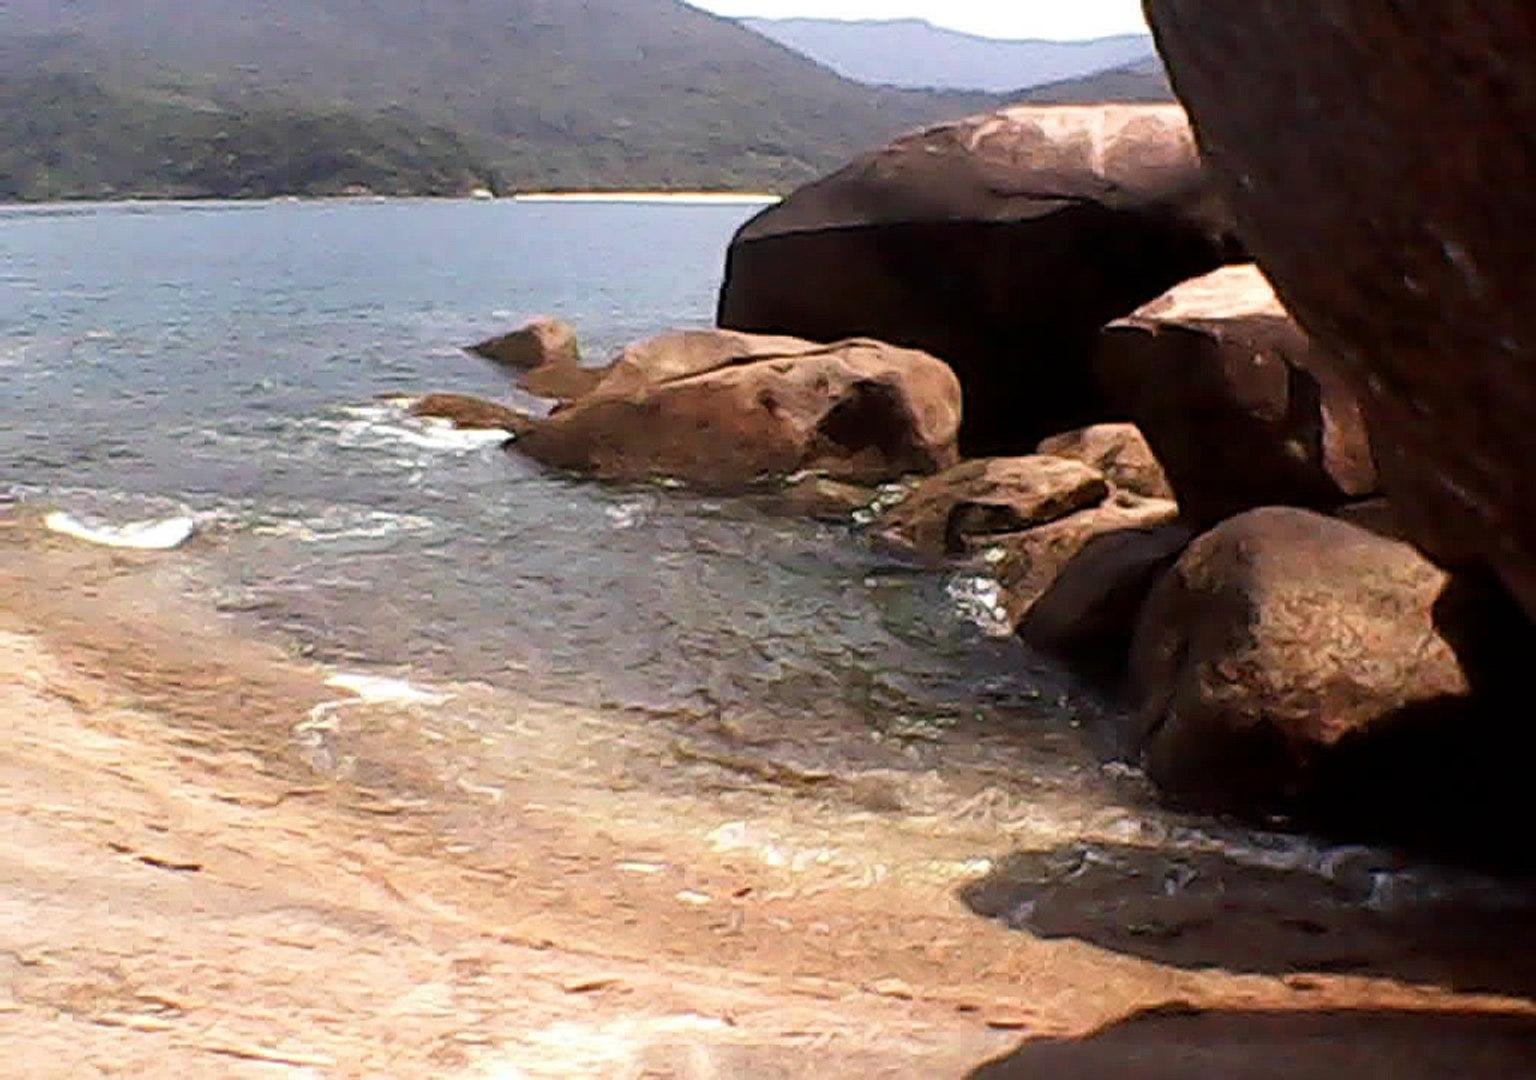 Laje da ilha do Prumirim, Litoral Norte de Ubatuba, SP, Brasil, ondas . mares e rochedos, novembro a